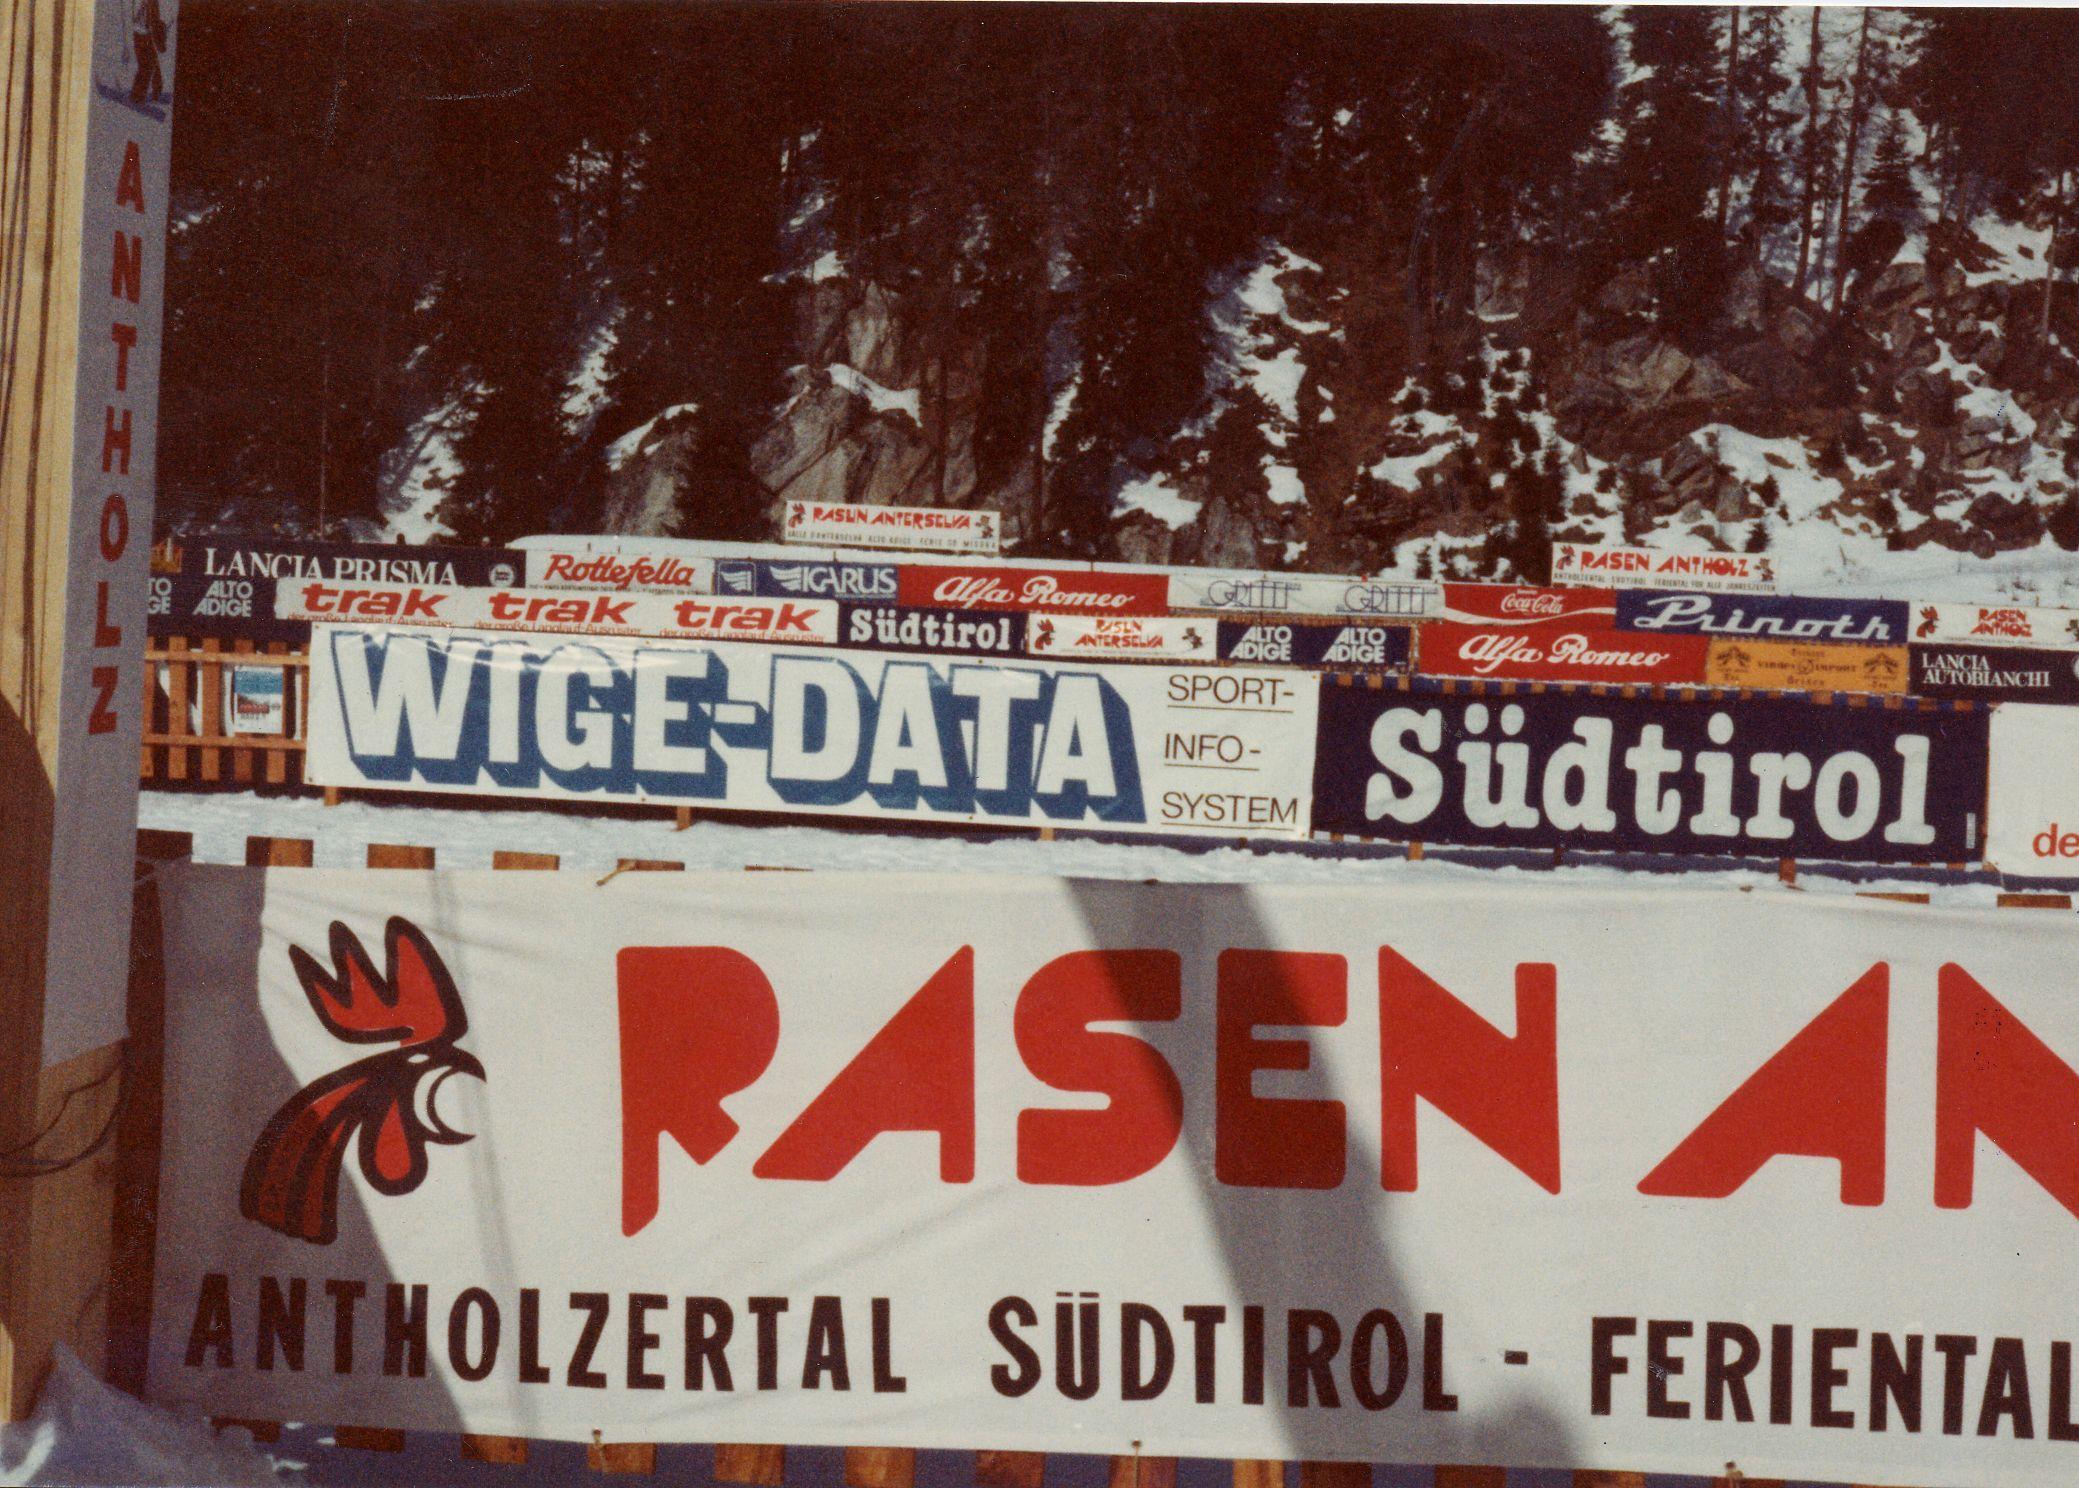 #ThrowbackThursday #80er #WIGE   #INTERSPORT #backtothe80ies #TBT #skispringen #4hils #skijumping #hoppschwiiz #roadto4hills #worldcup #Winterzeit #Motorsport #DTM #Leichtathletik #Sport #Rally #Rallye #Racing #AutoRacing #RACE #Sport #NEWS #Business #Medien #TV #DRM #DeutscheRallyeMeisterschaft #Südtirol #Tirol #Schnee #Winterspor